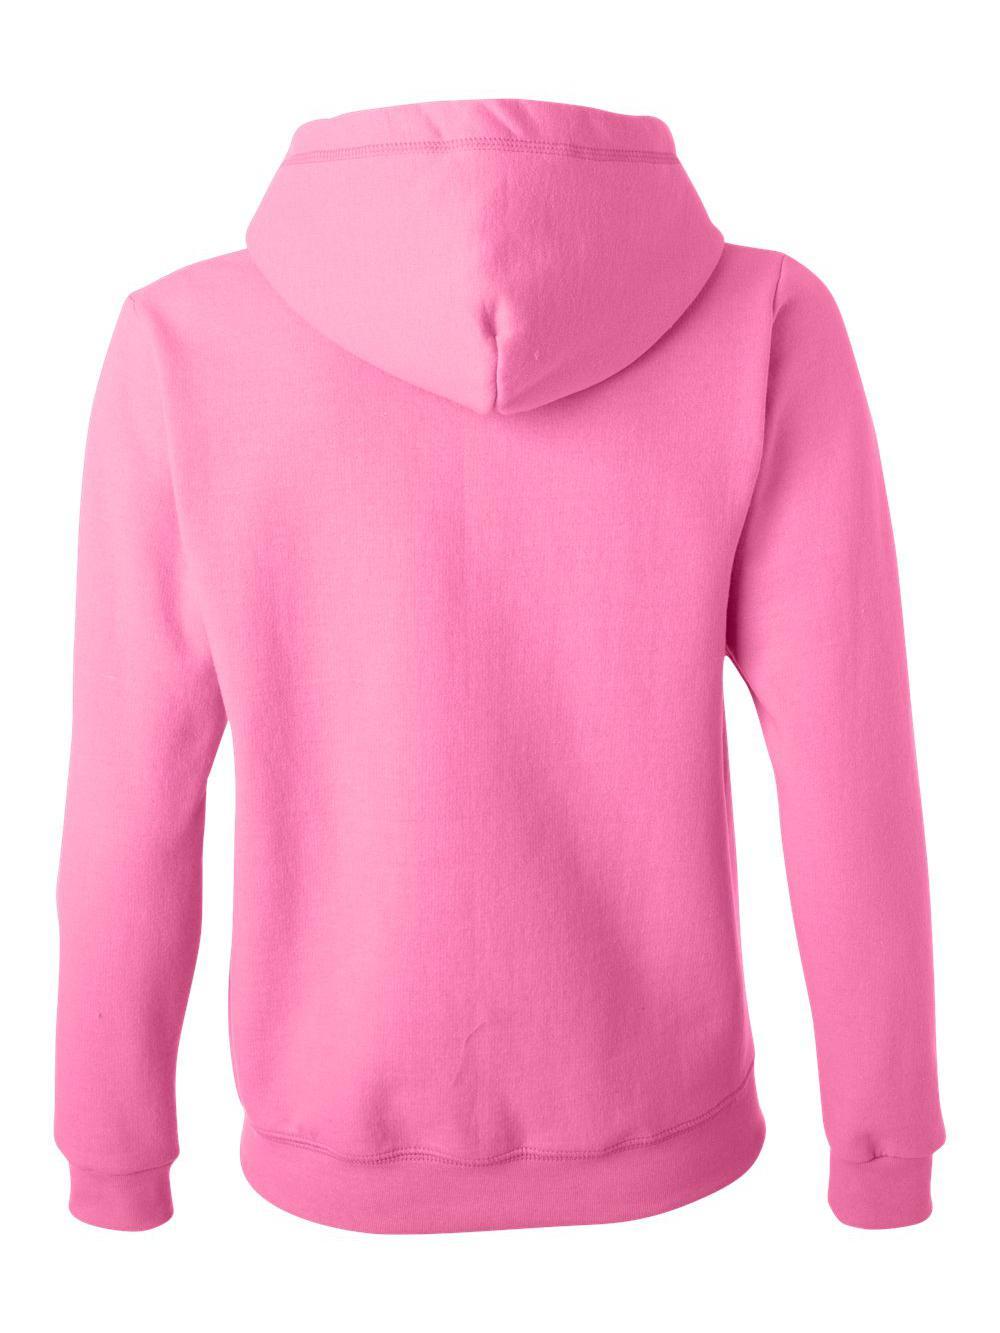 Gildan-Heavy-Blend-Women-039-s-Full-Zip-Hooded-Sweatshirt-18600FL thumbnail 4